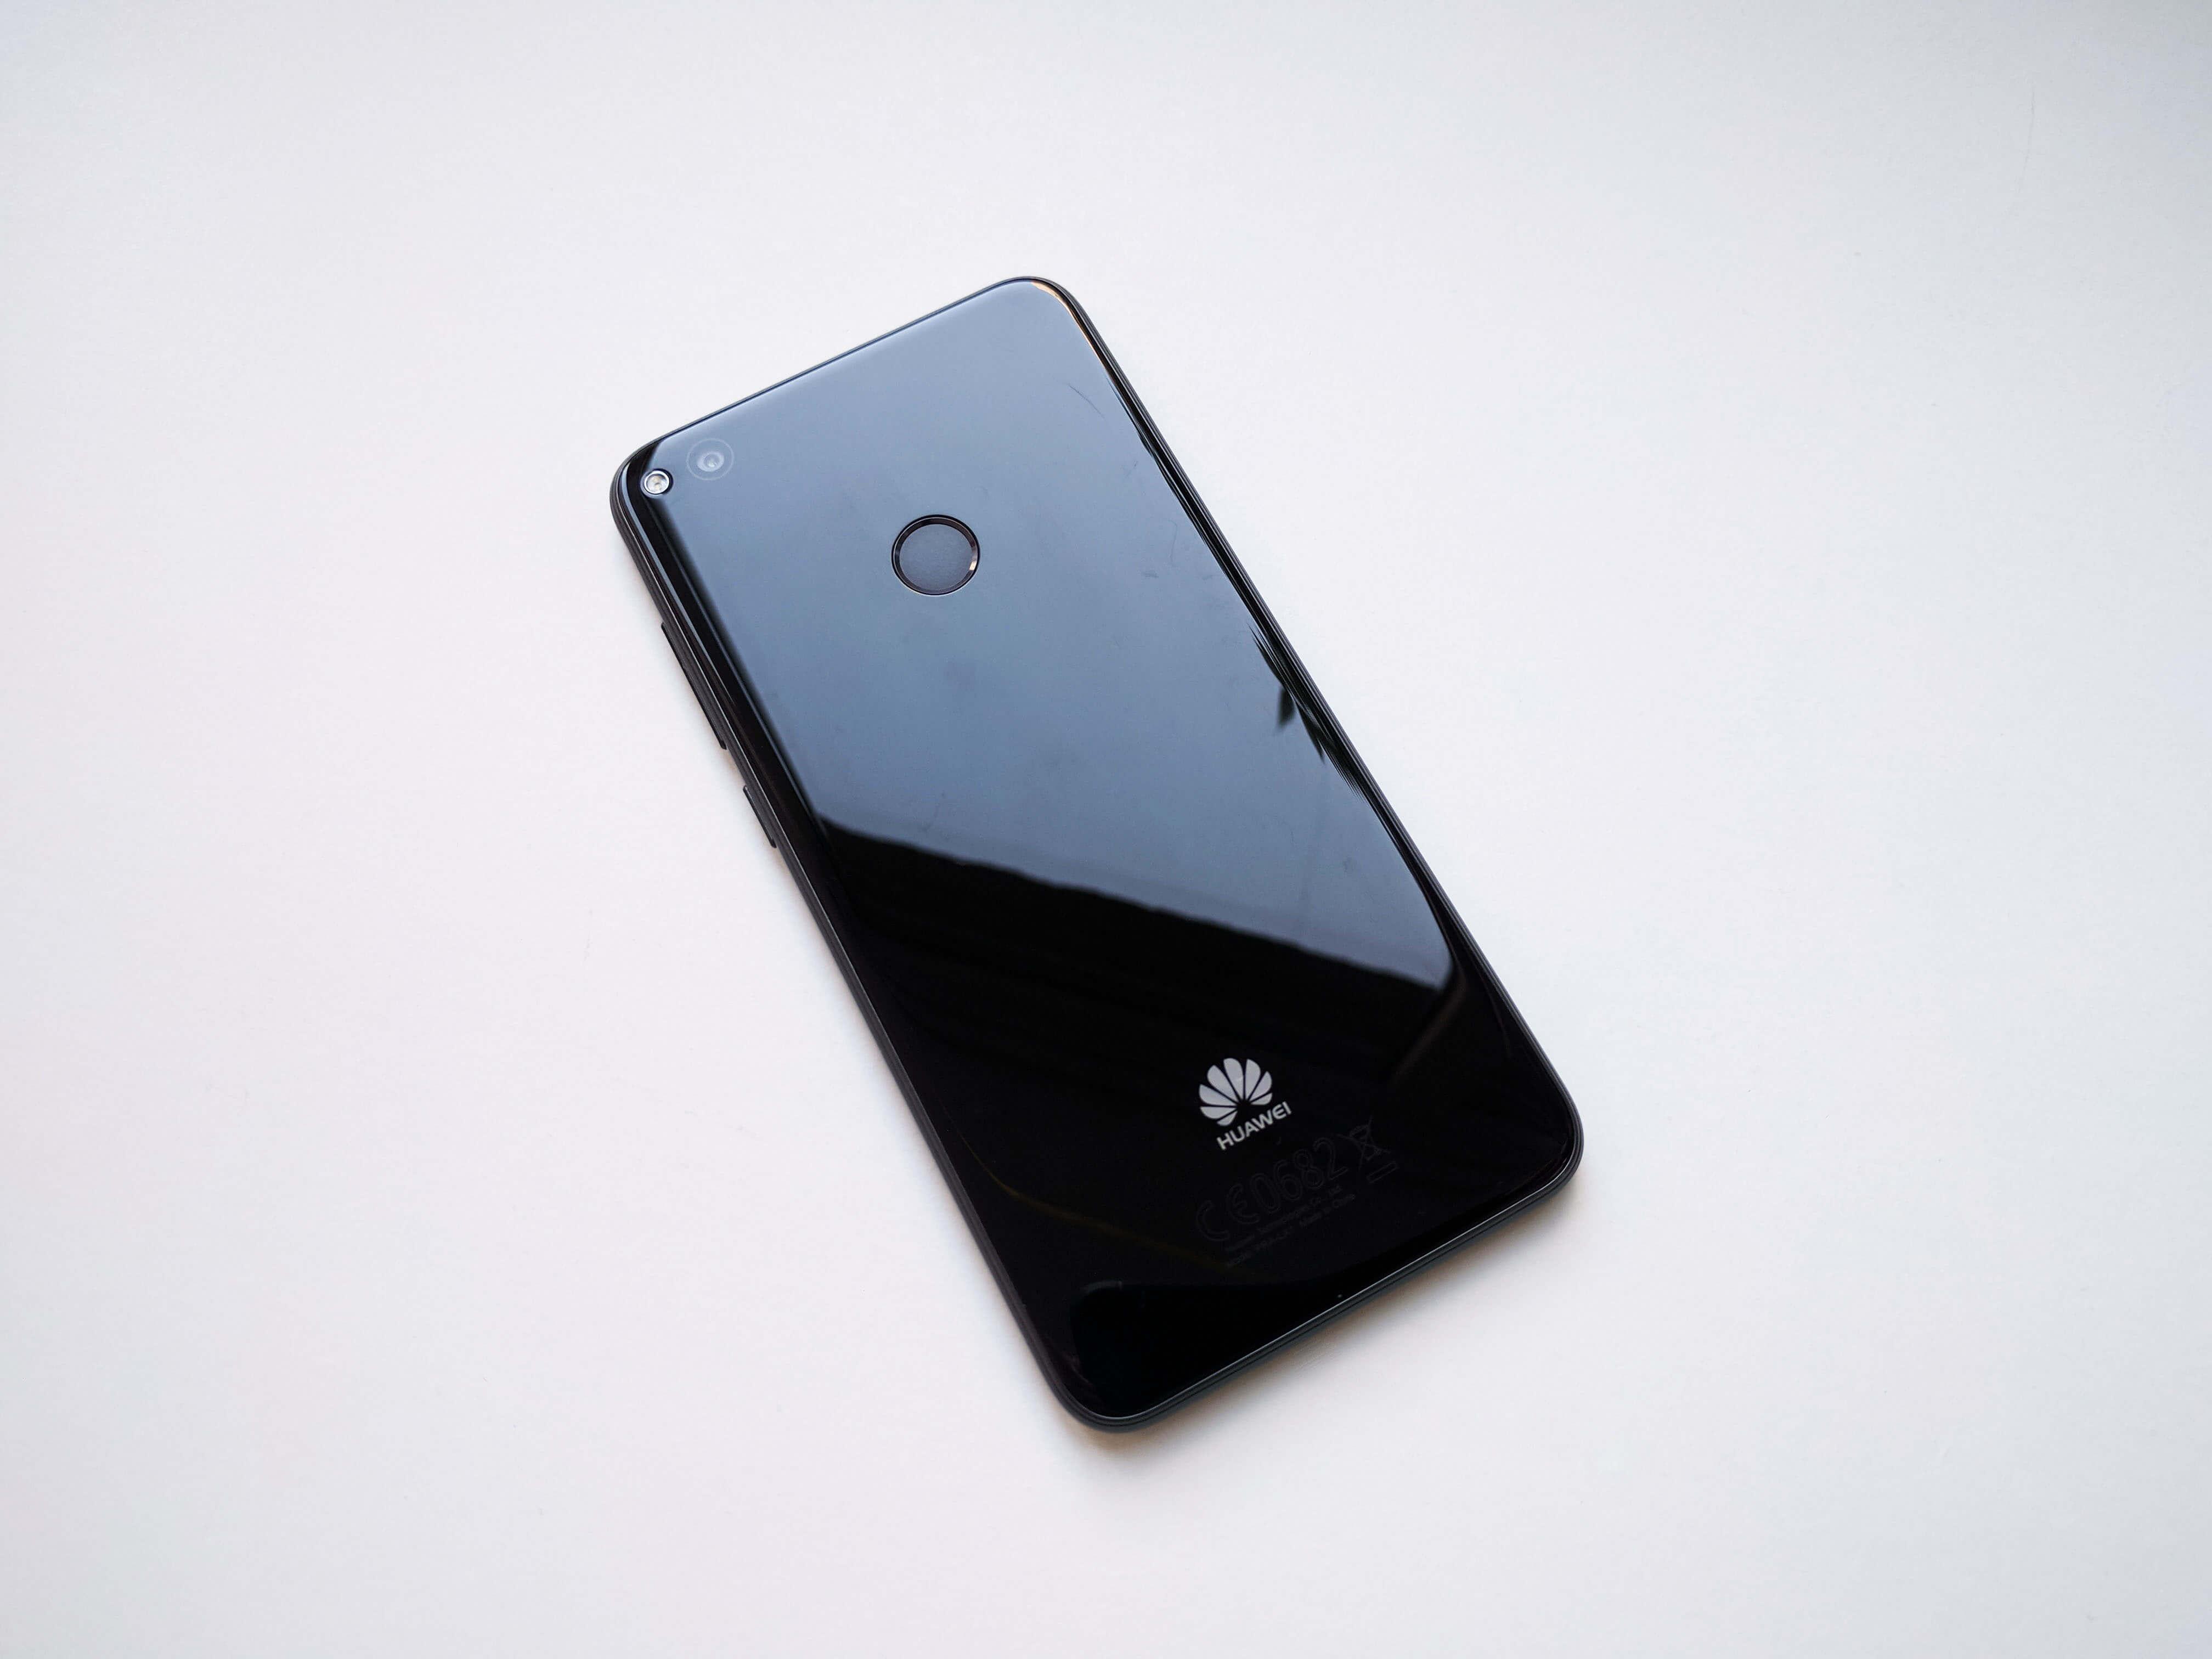 Huawei P9 Lite (2017) Review Romana, Pareri - Foto 2